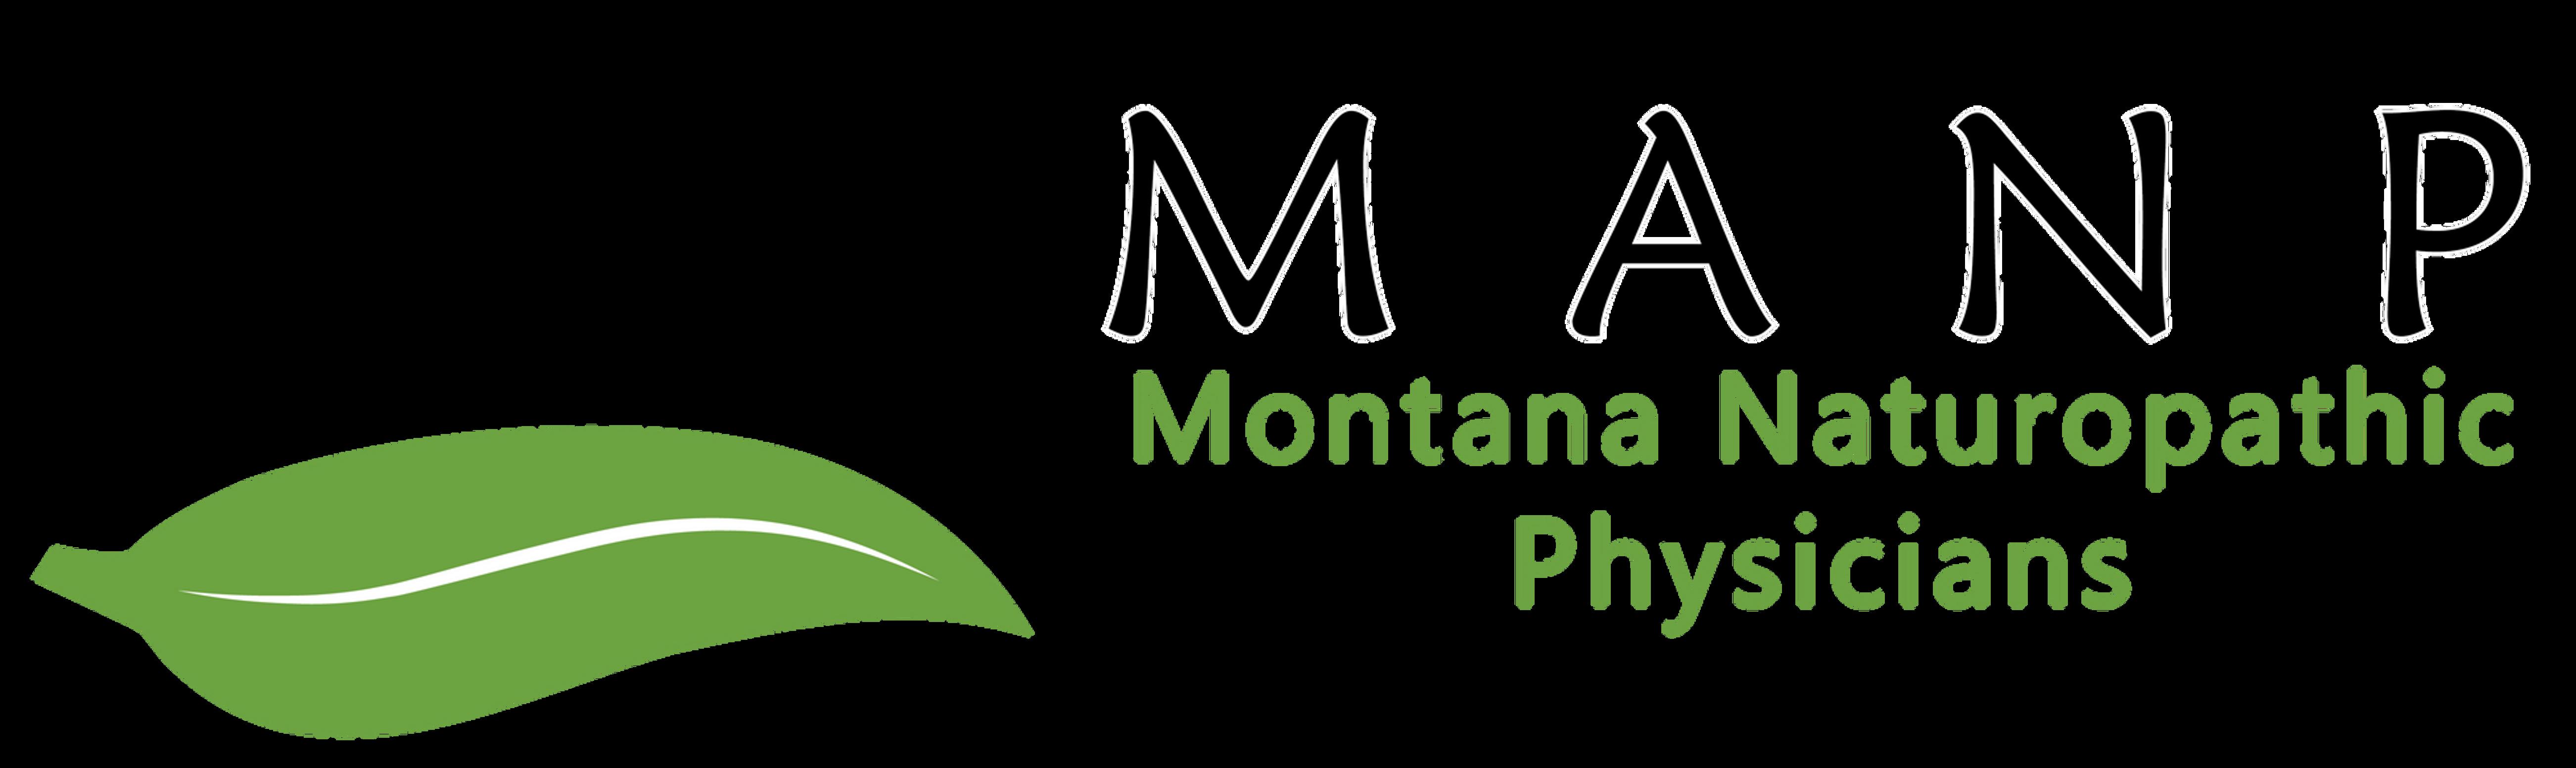 Montana Naturopathic Physicians